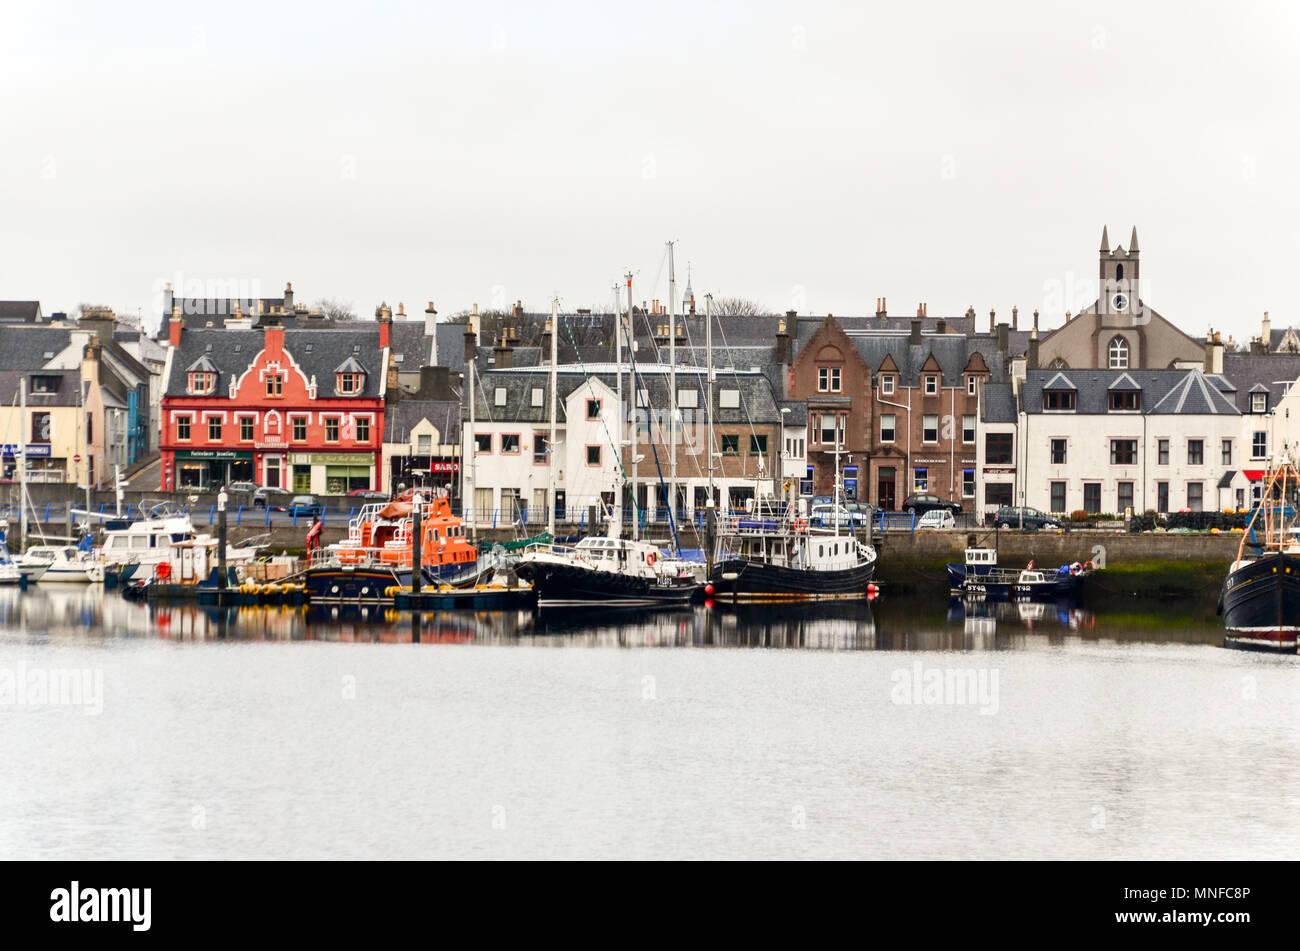 Stornoway waterfront, Lewis and Harris Scotland - Stock Image